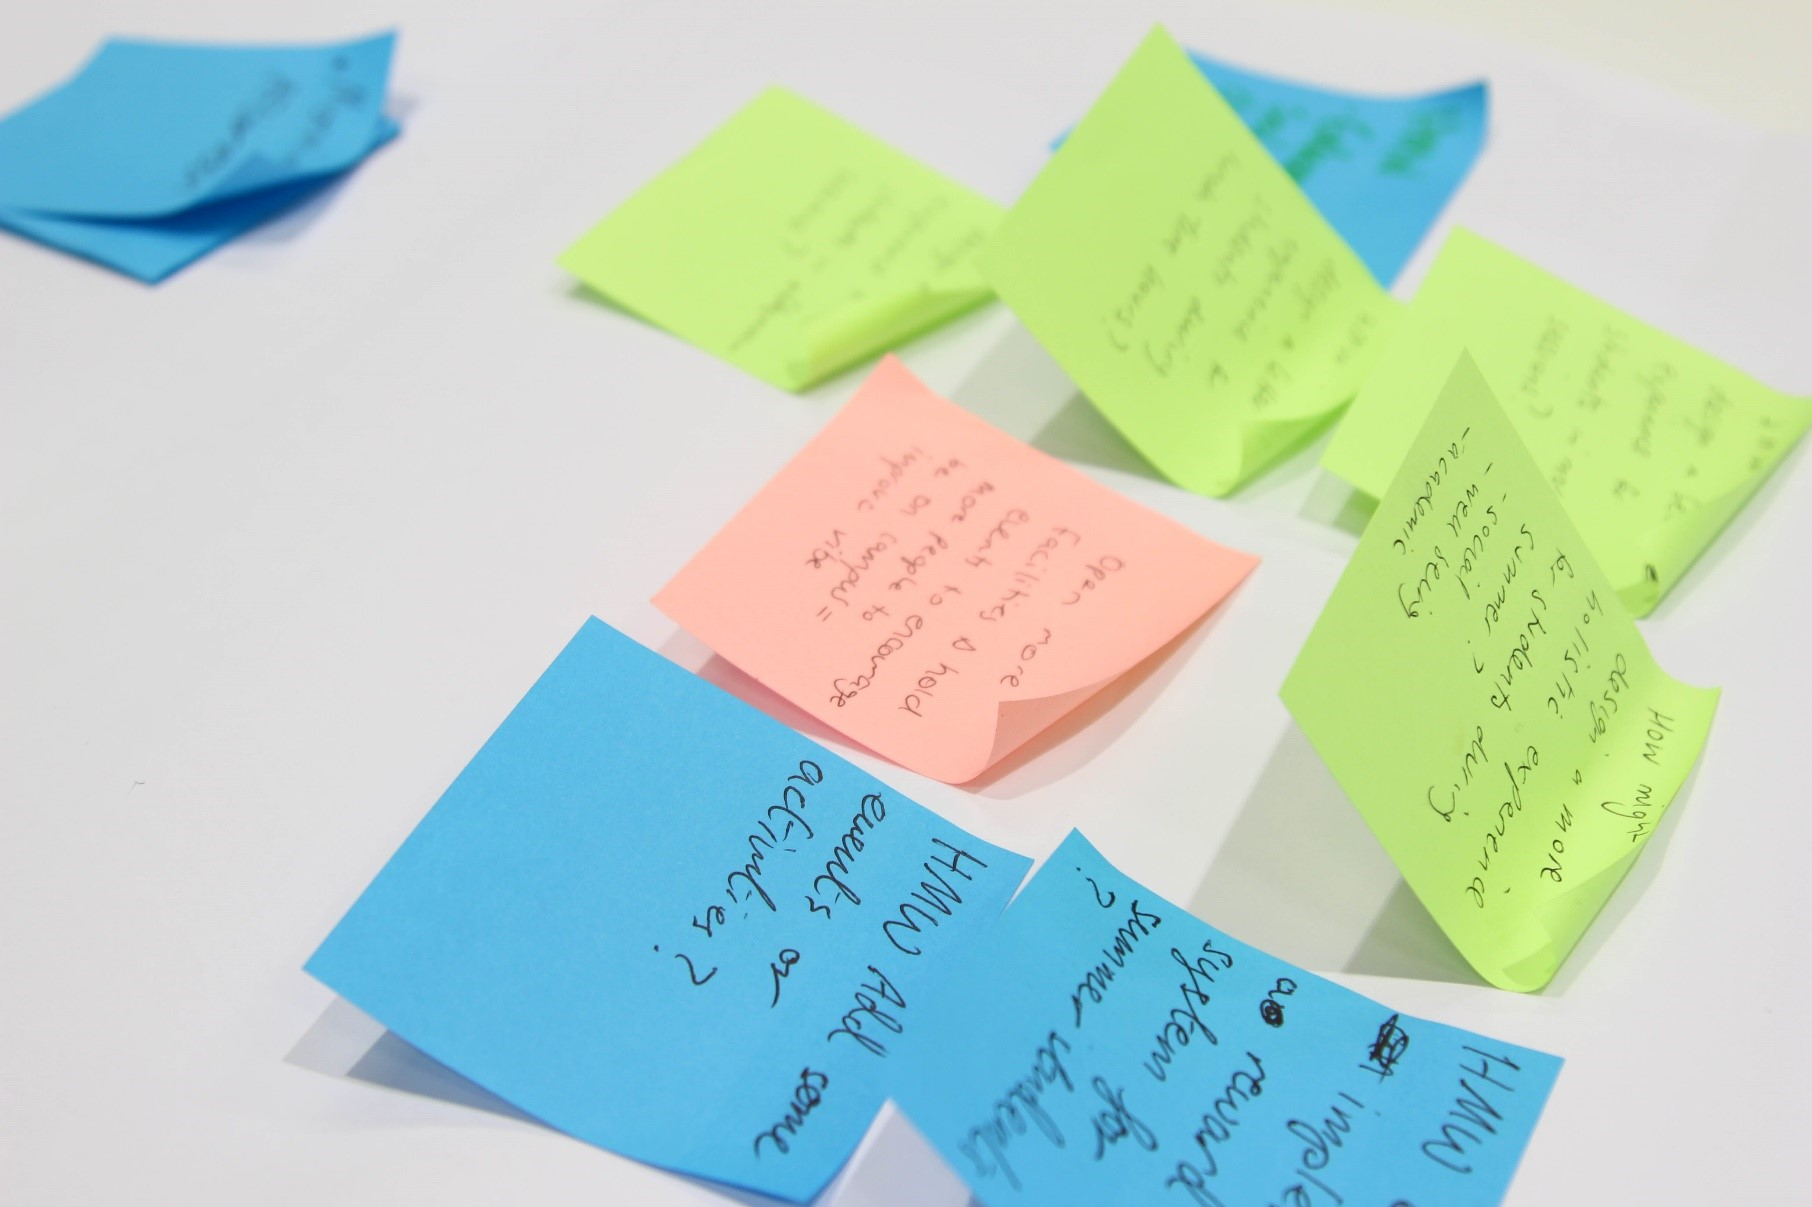 Different colour post-it notes on a desk